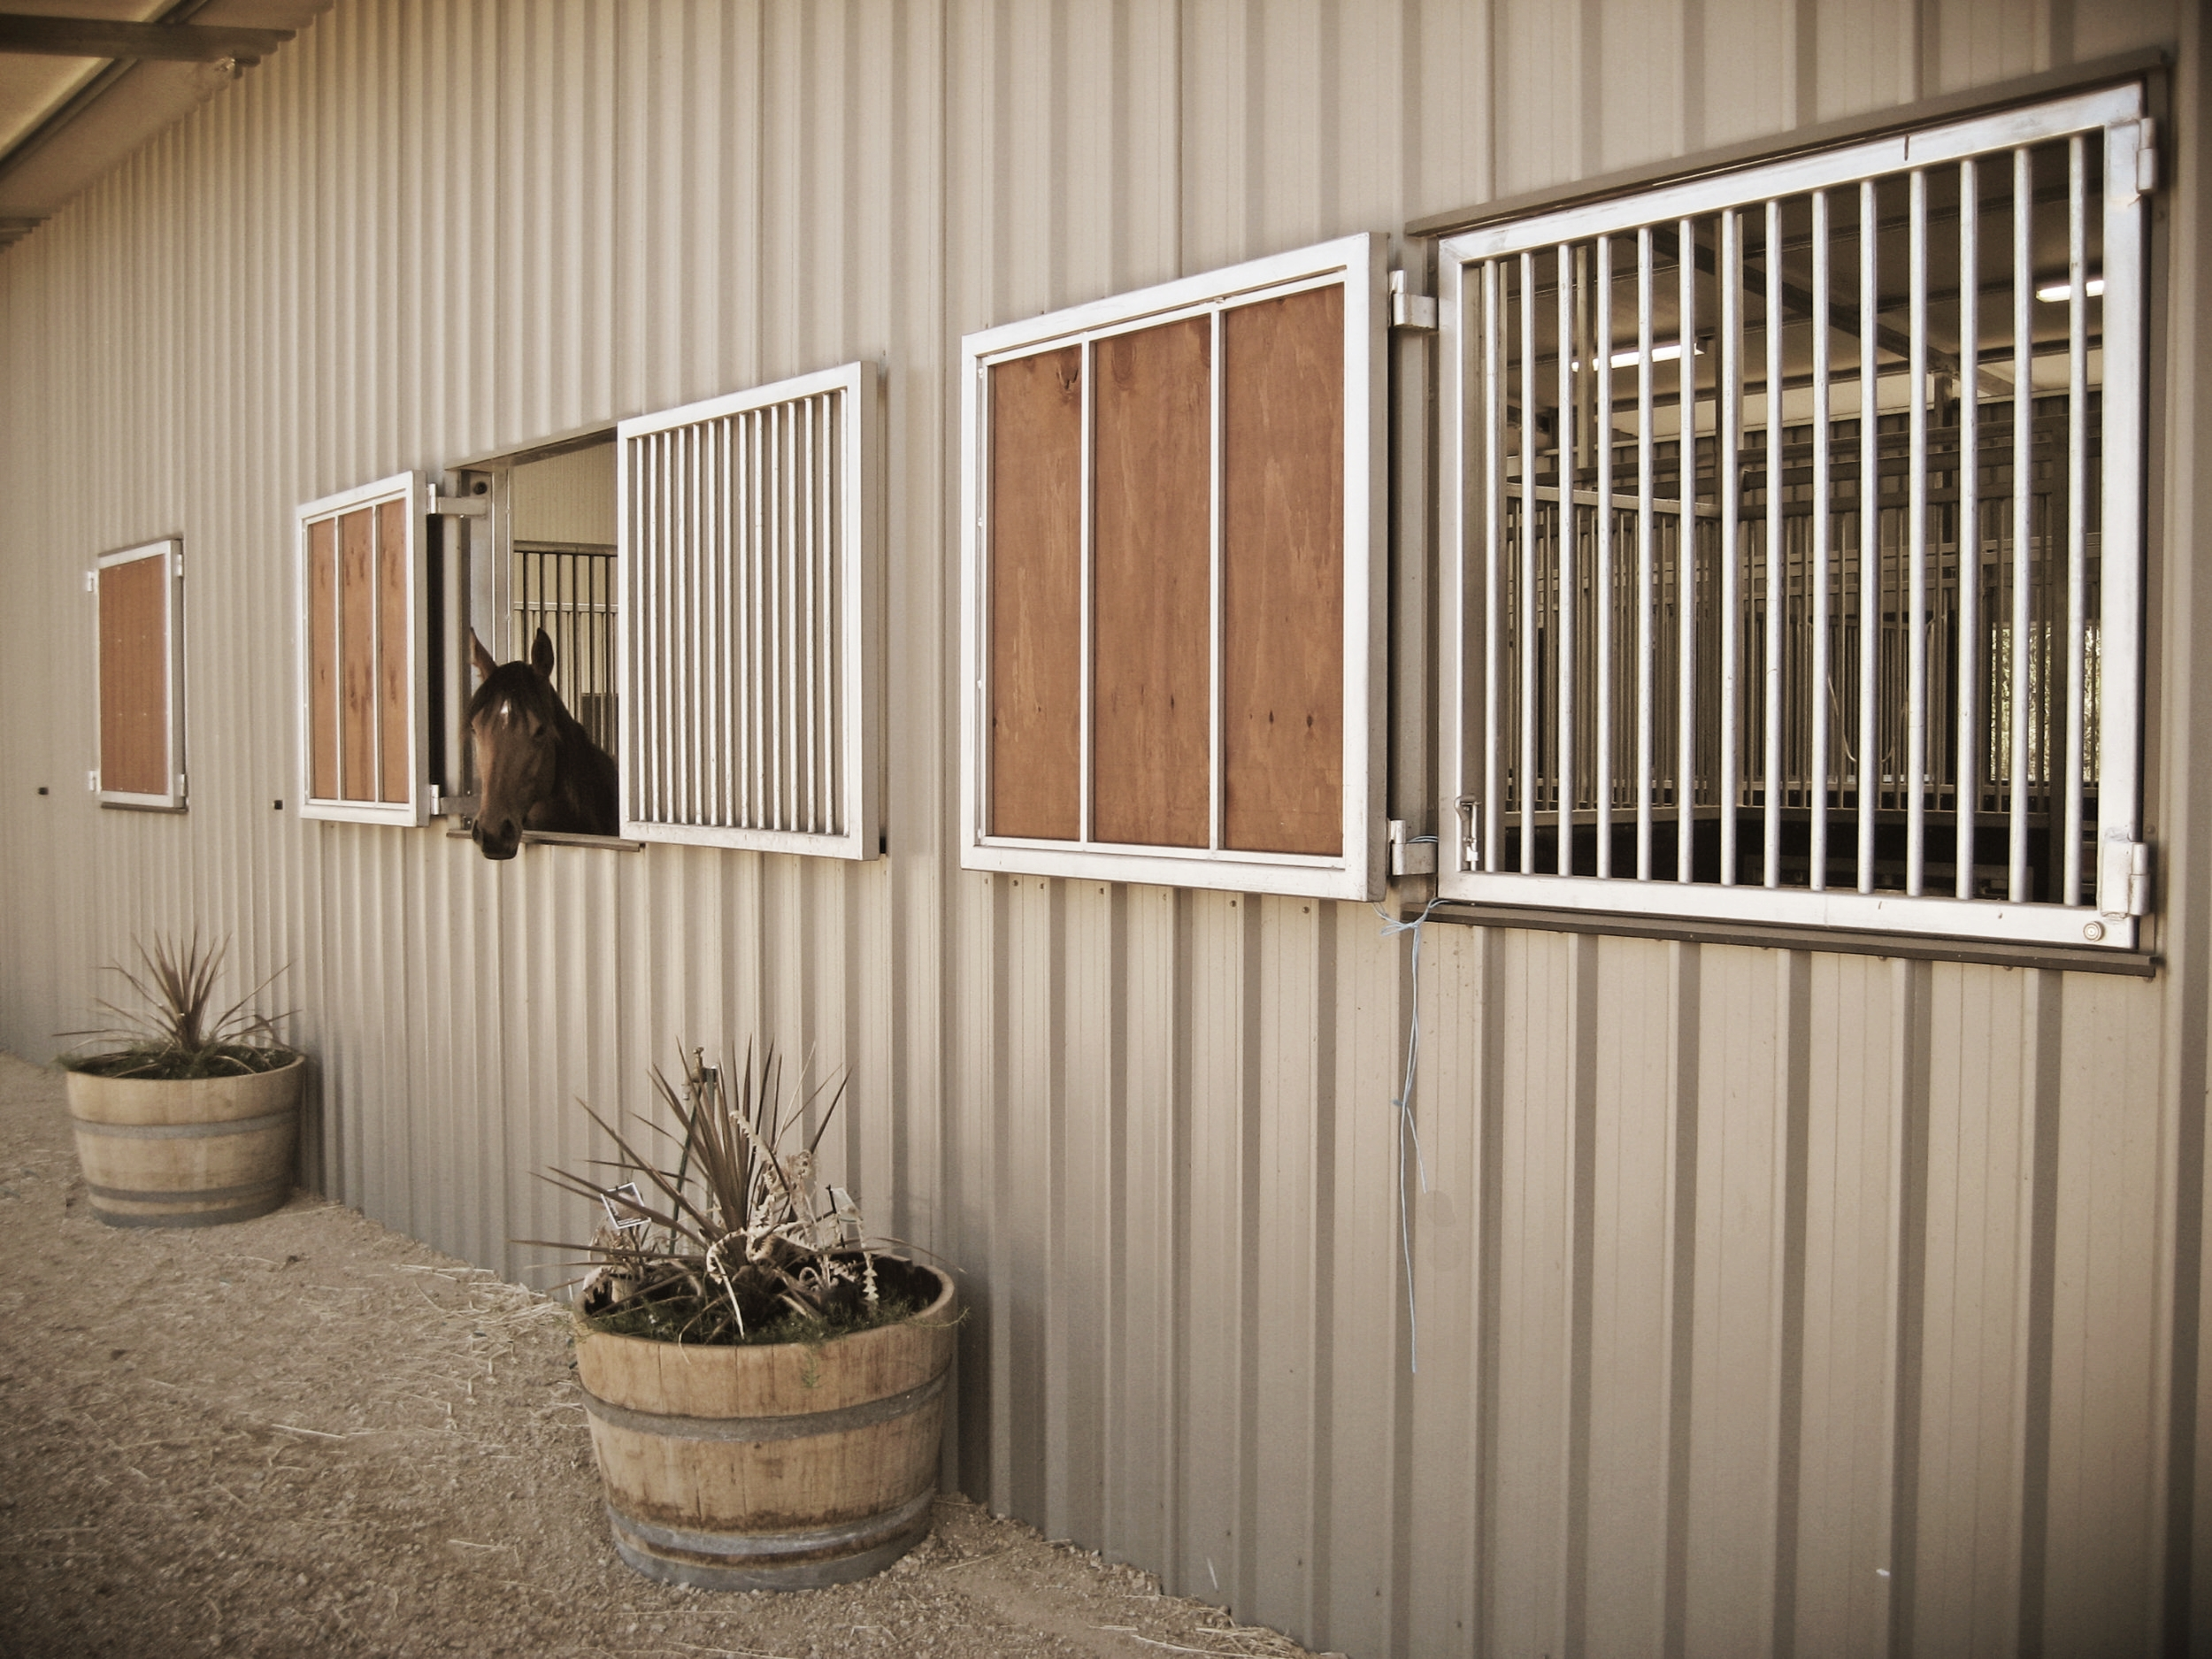 Keysborough Equine Rehabilitation and Agistment Centre